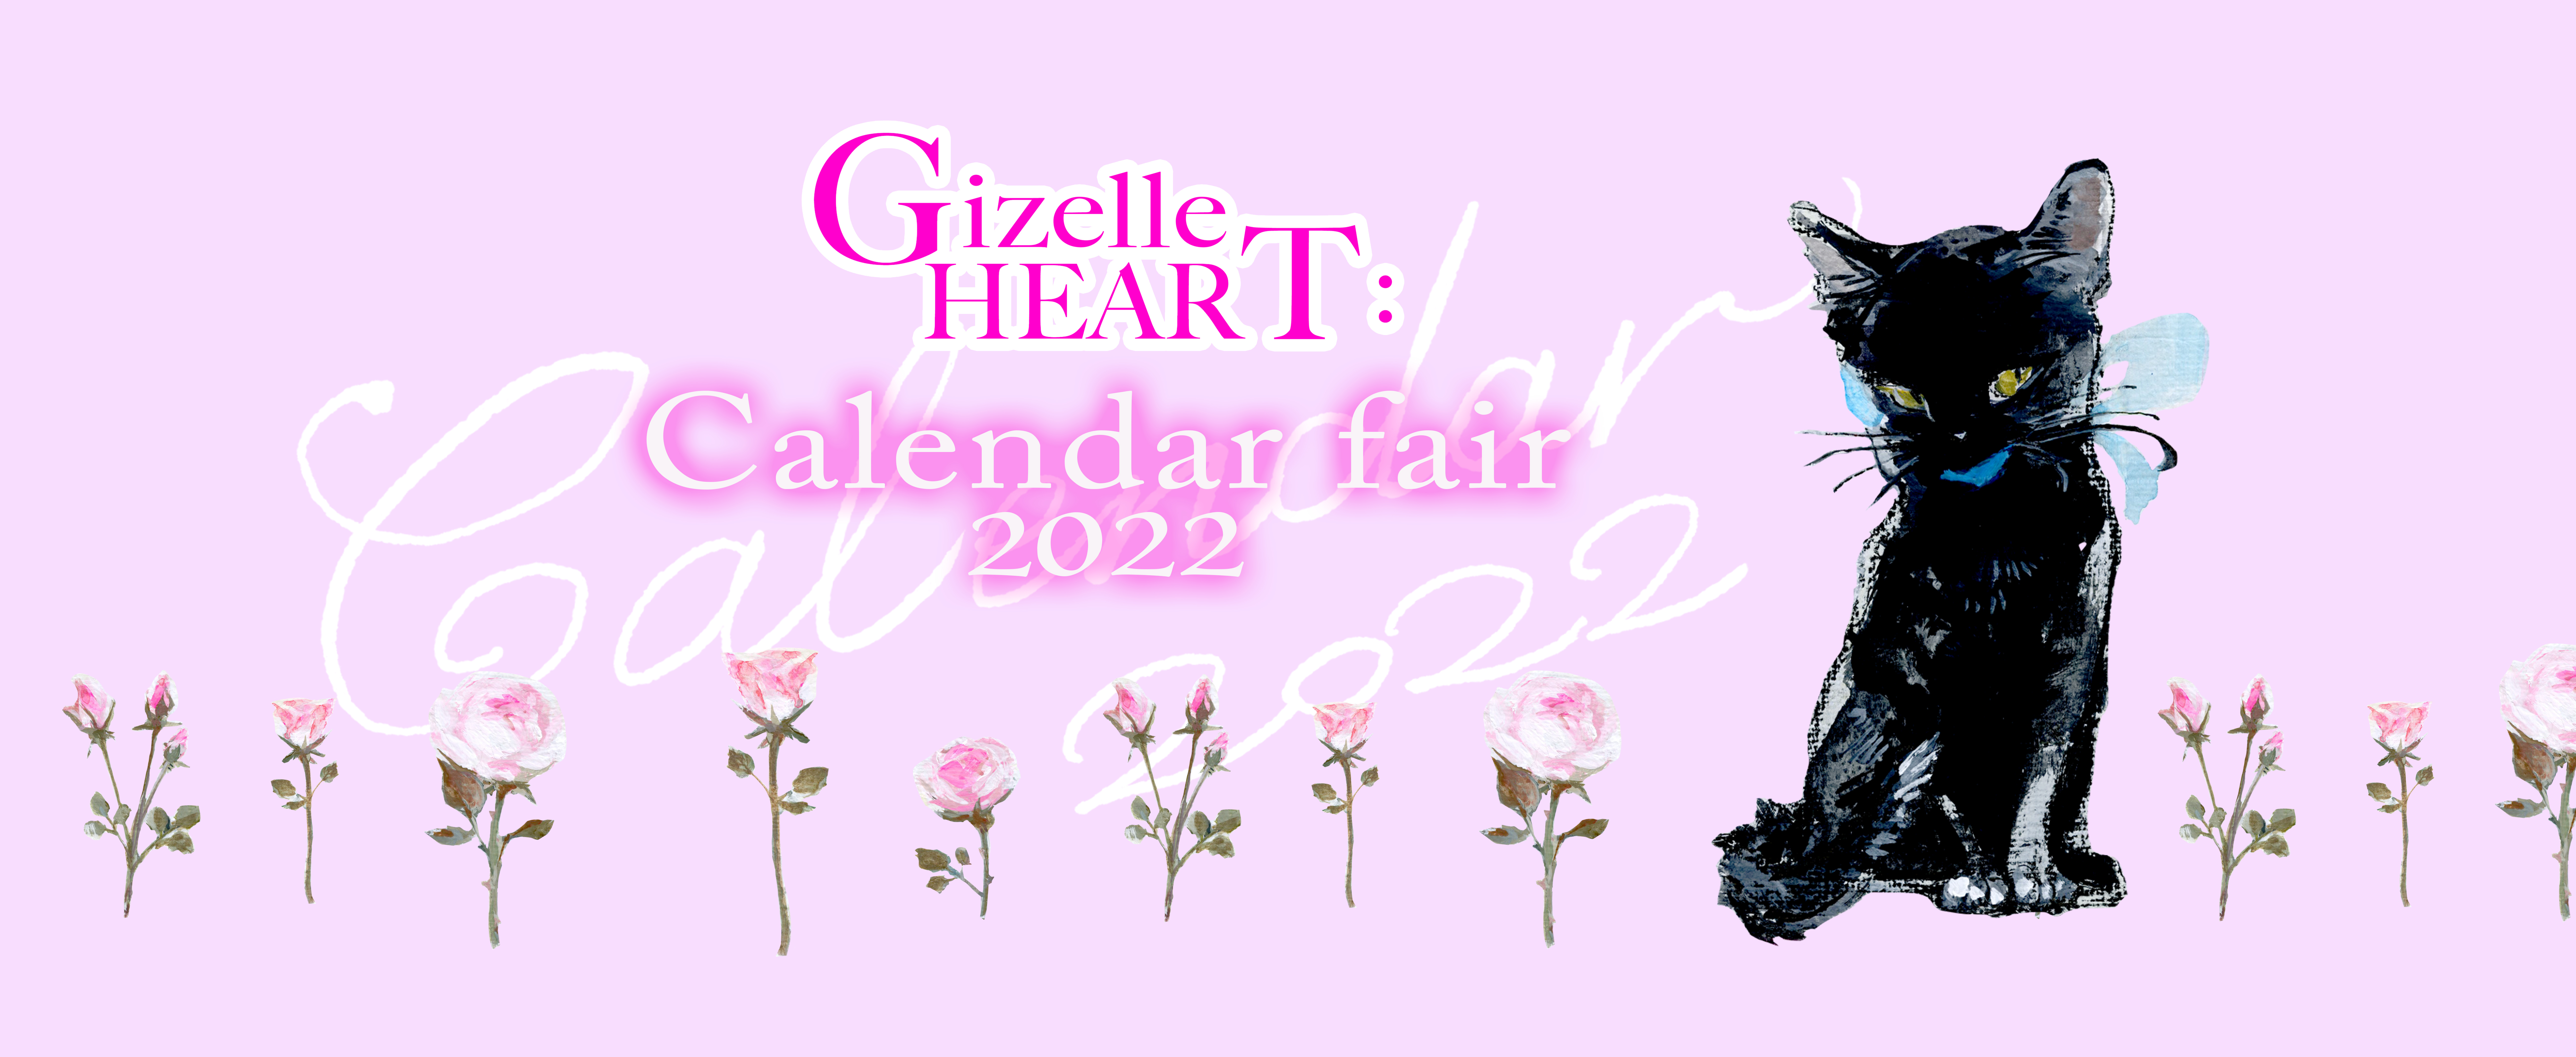 Gizelle HEART: